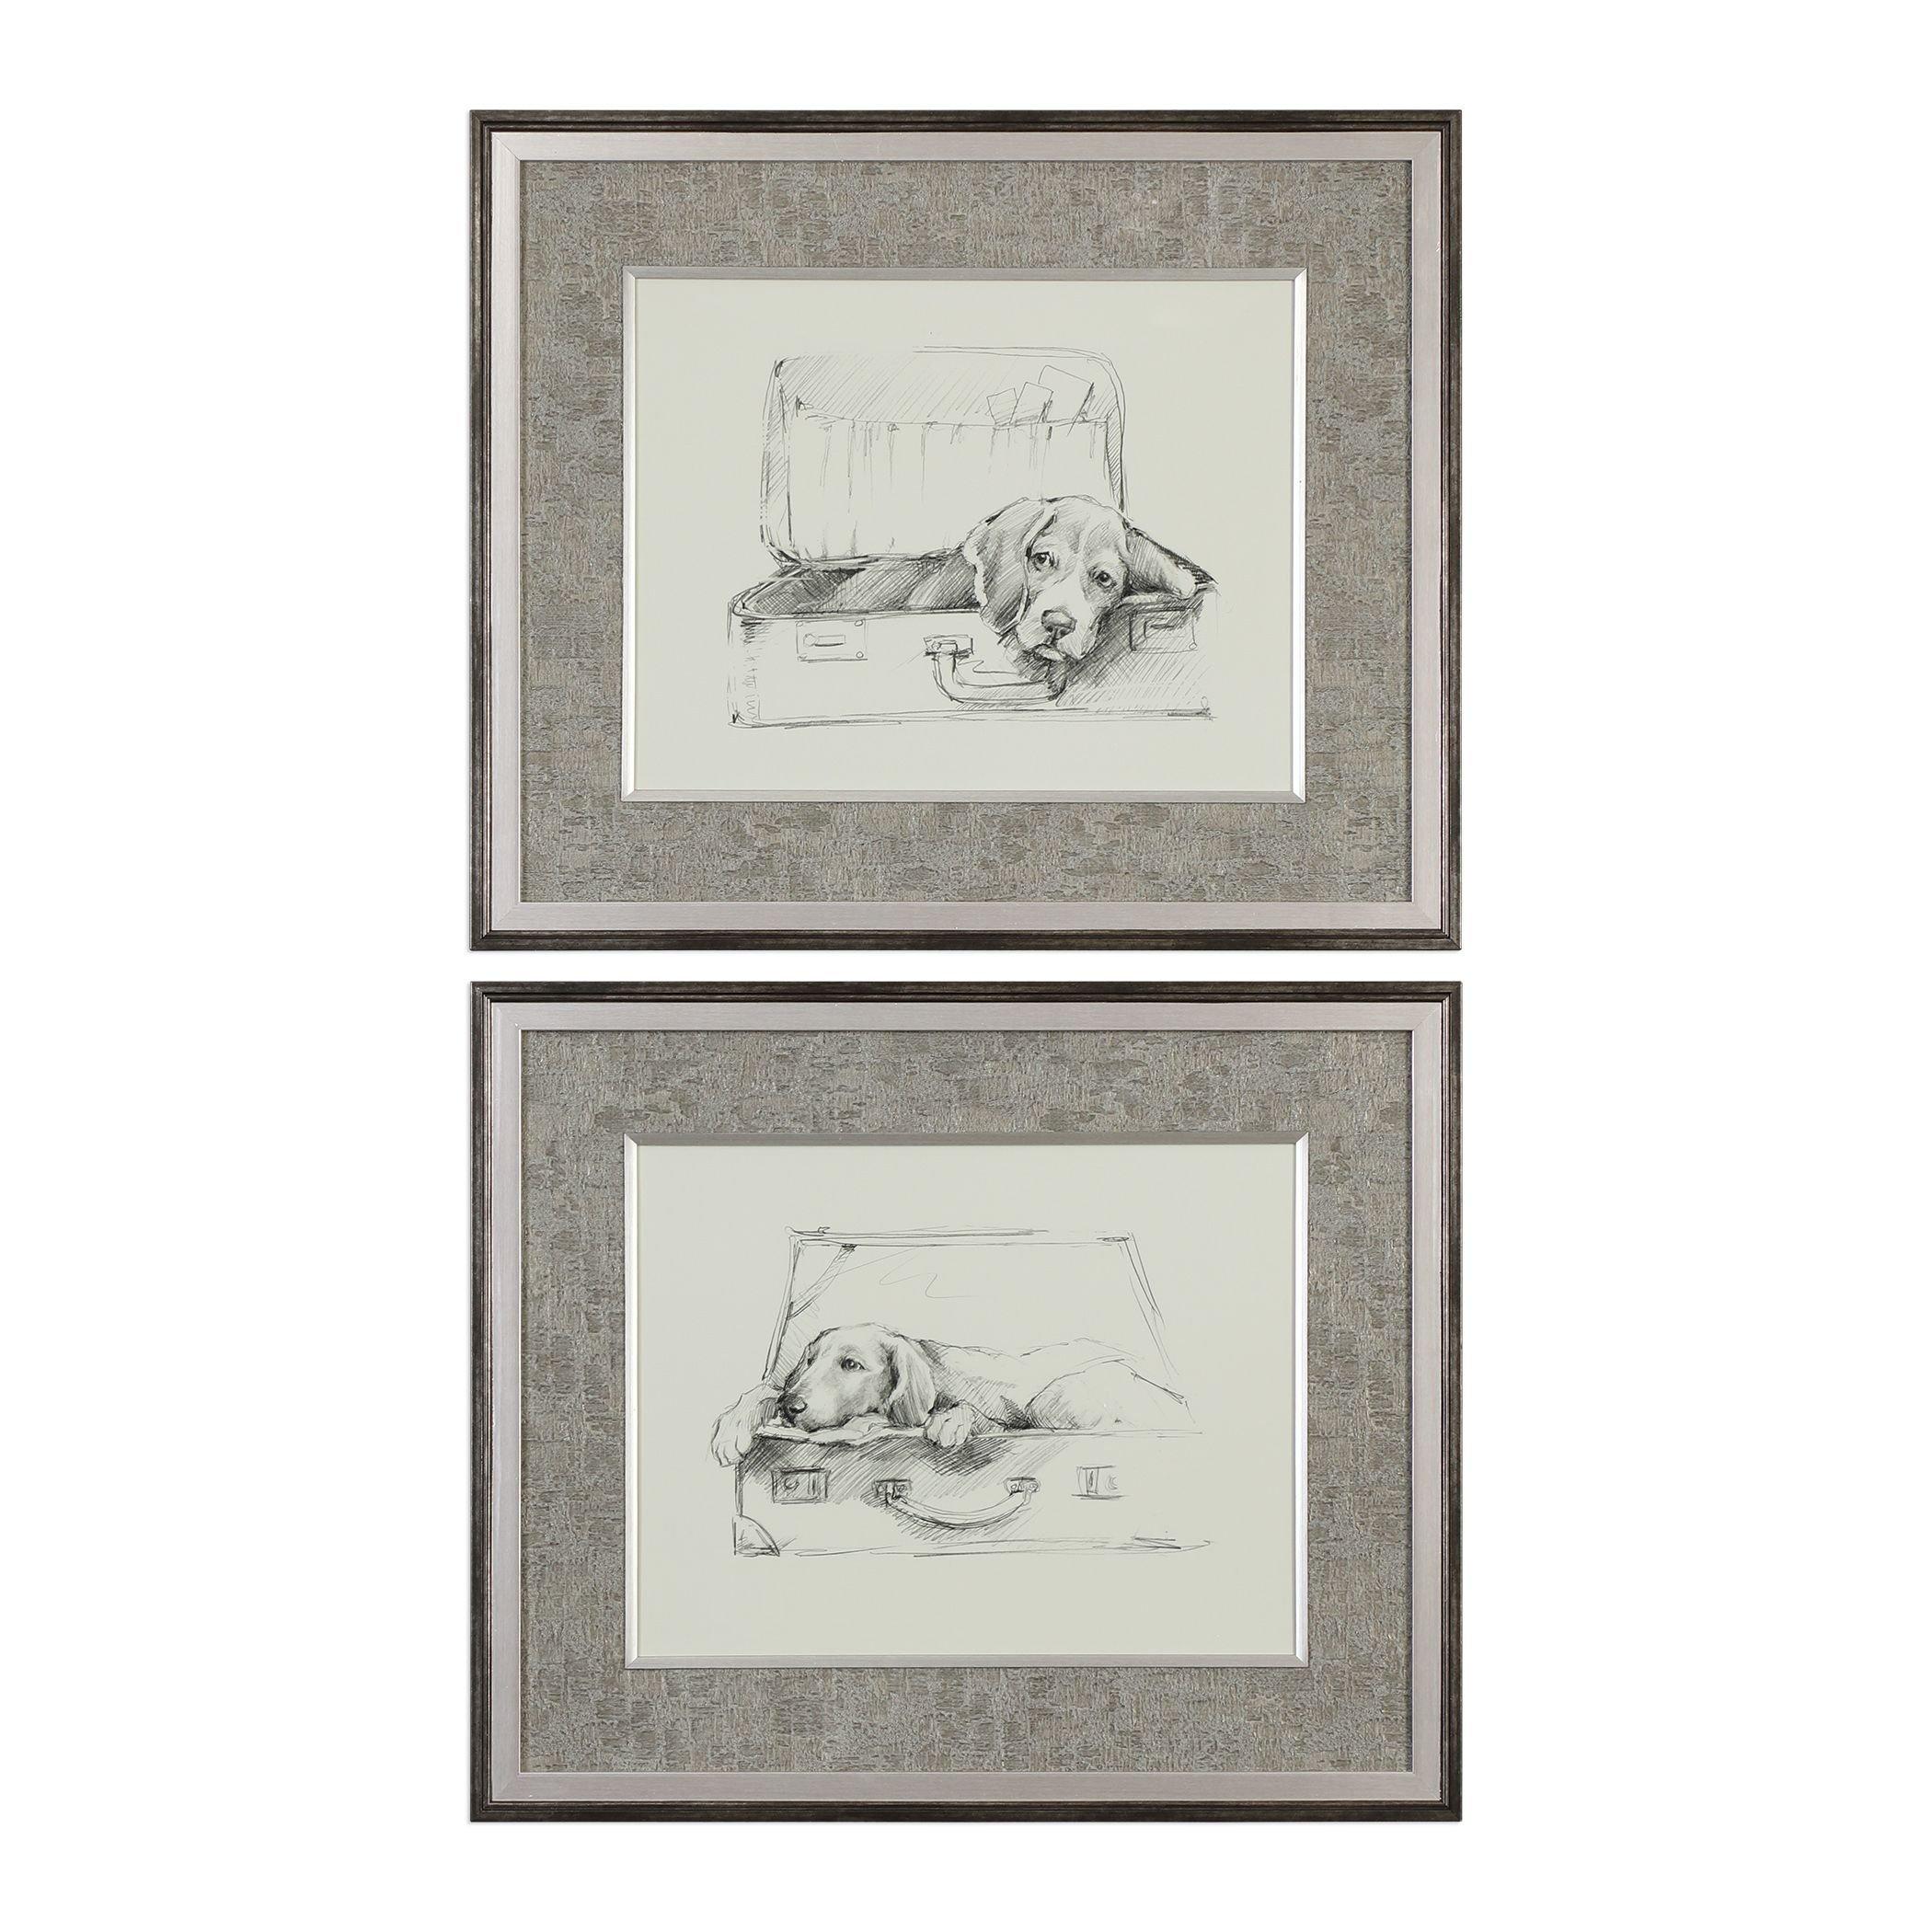 Uttermost 33678 Stowaway Dog Framed Prints - Set of 2